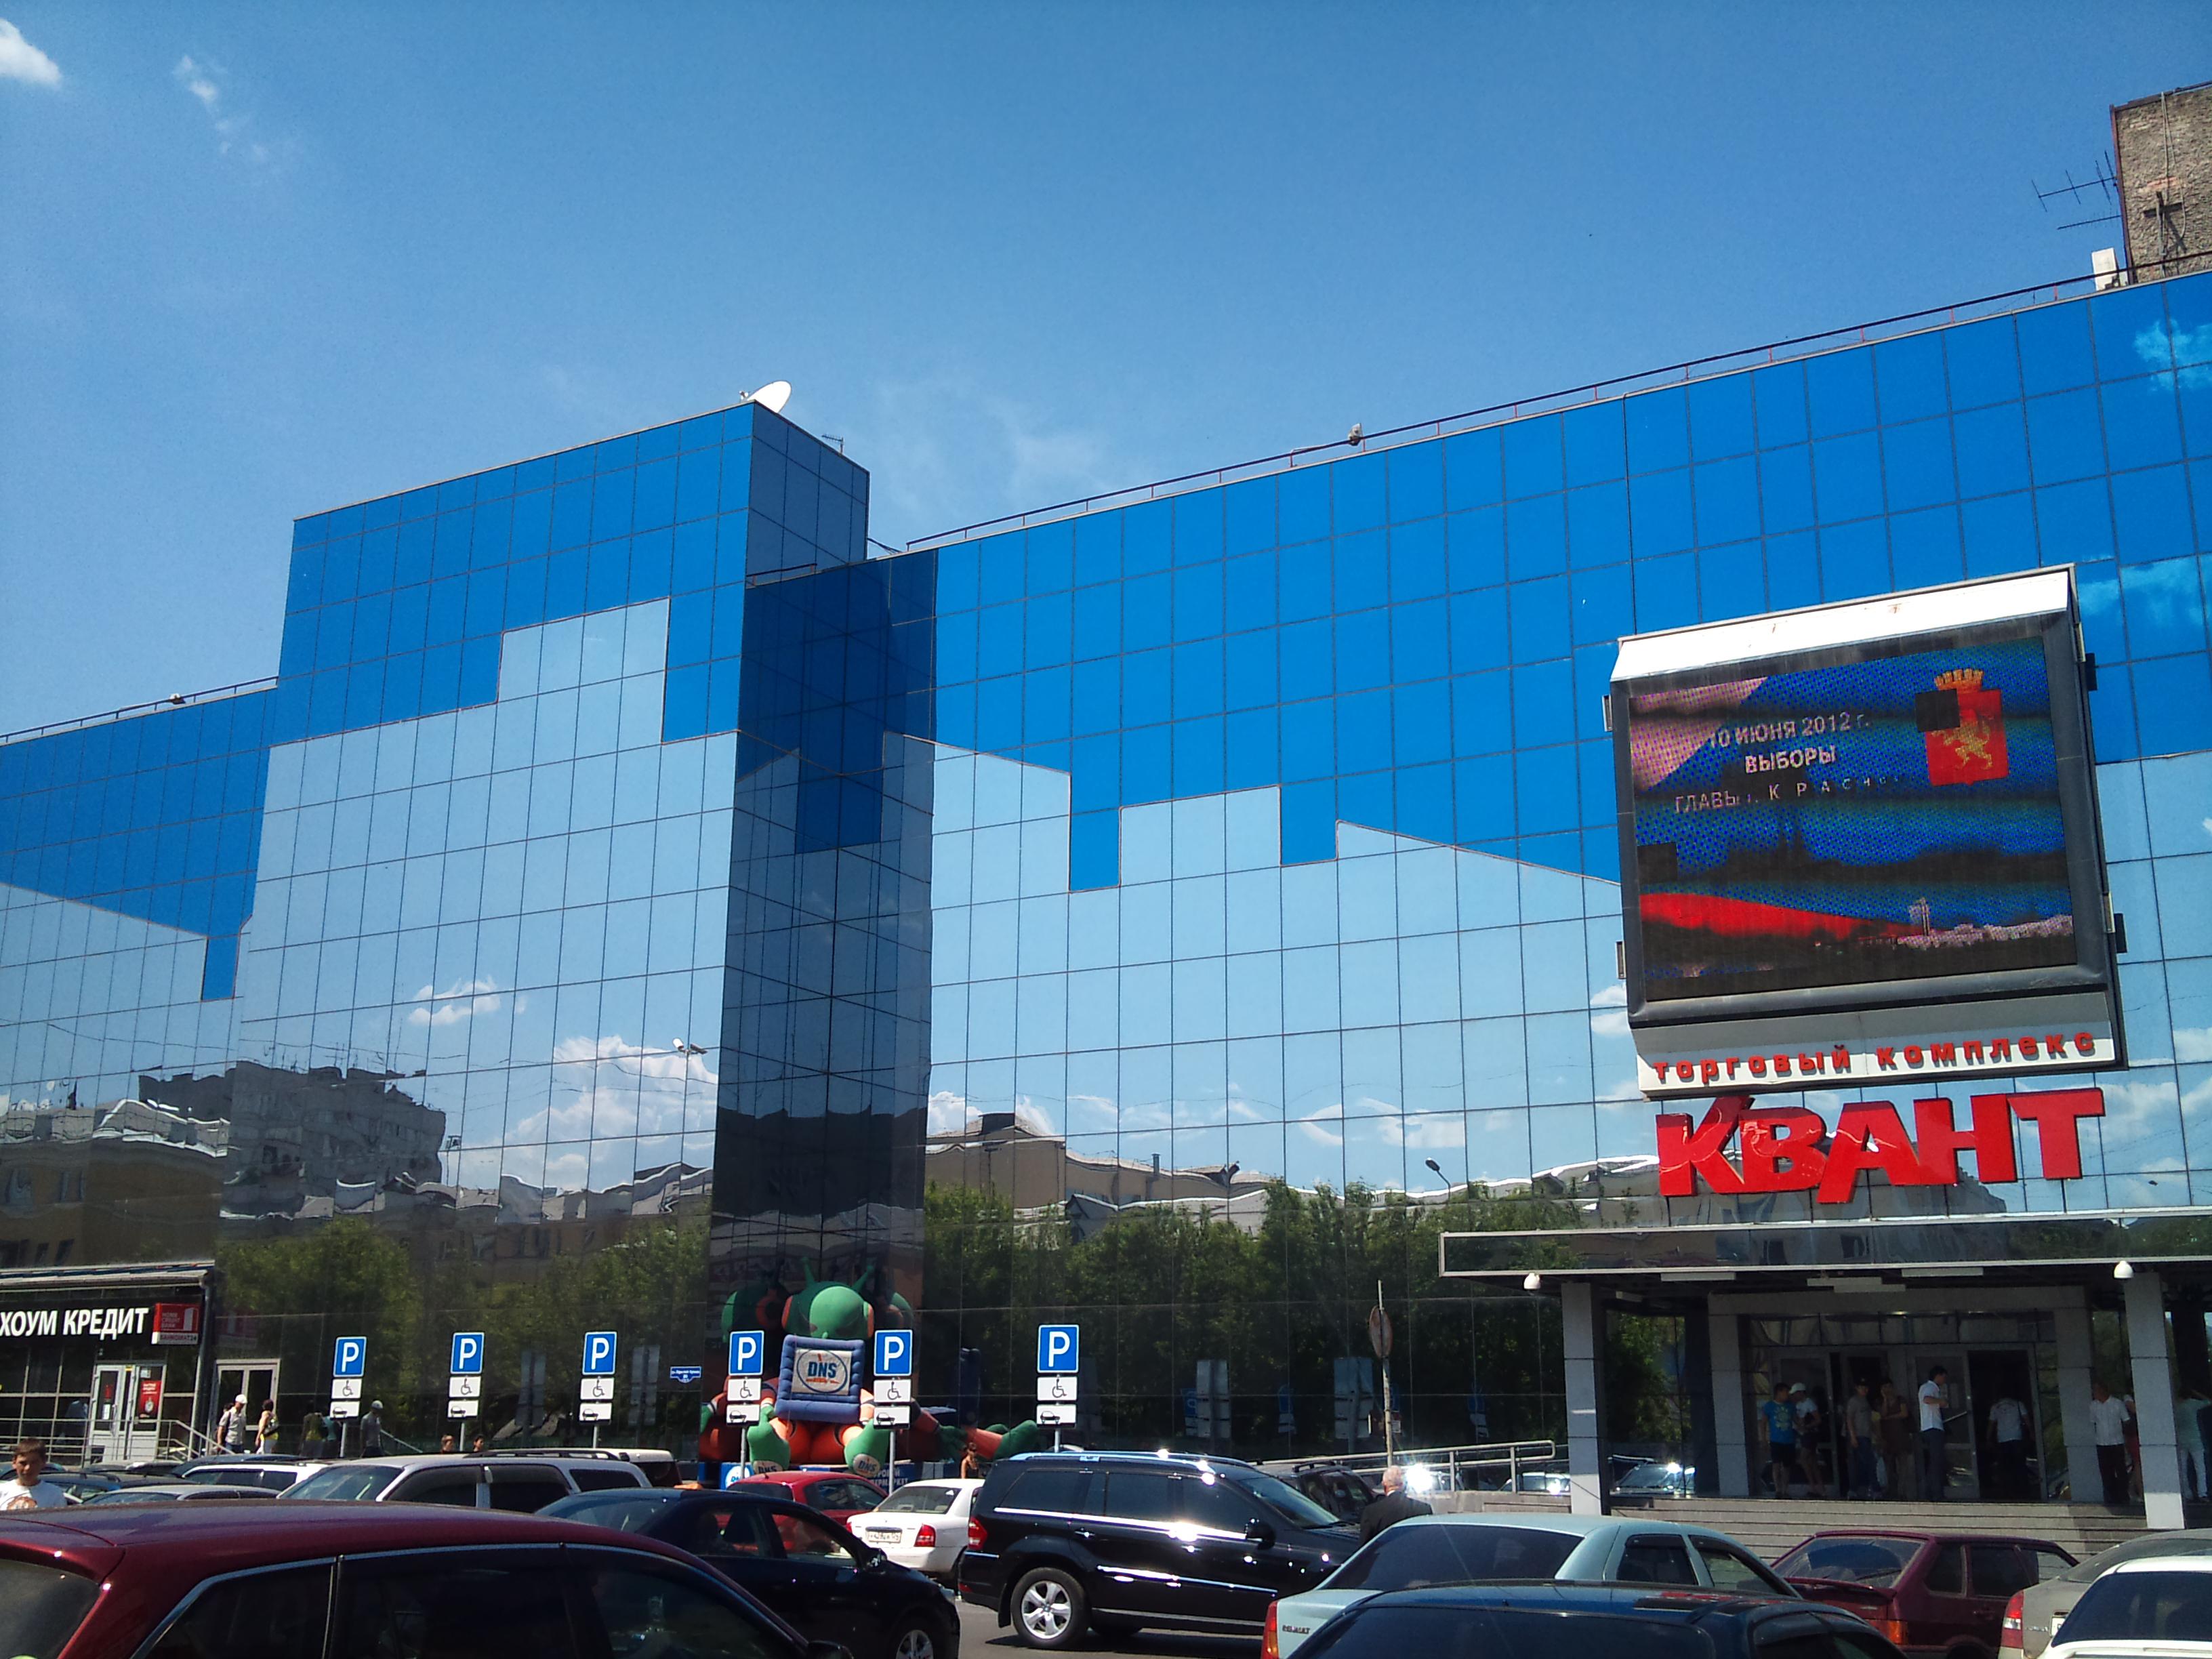 Красноярск ТЦ Квант. 4.06.2012 года